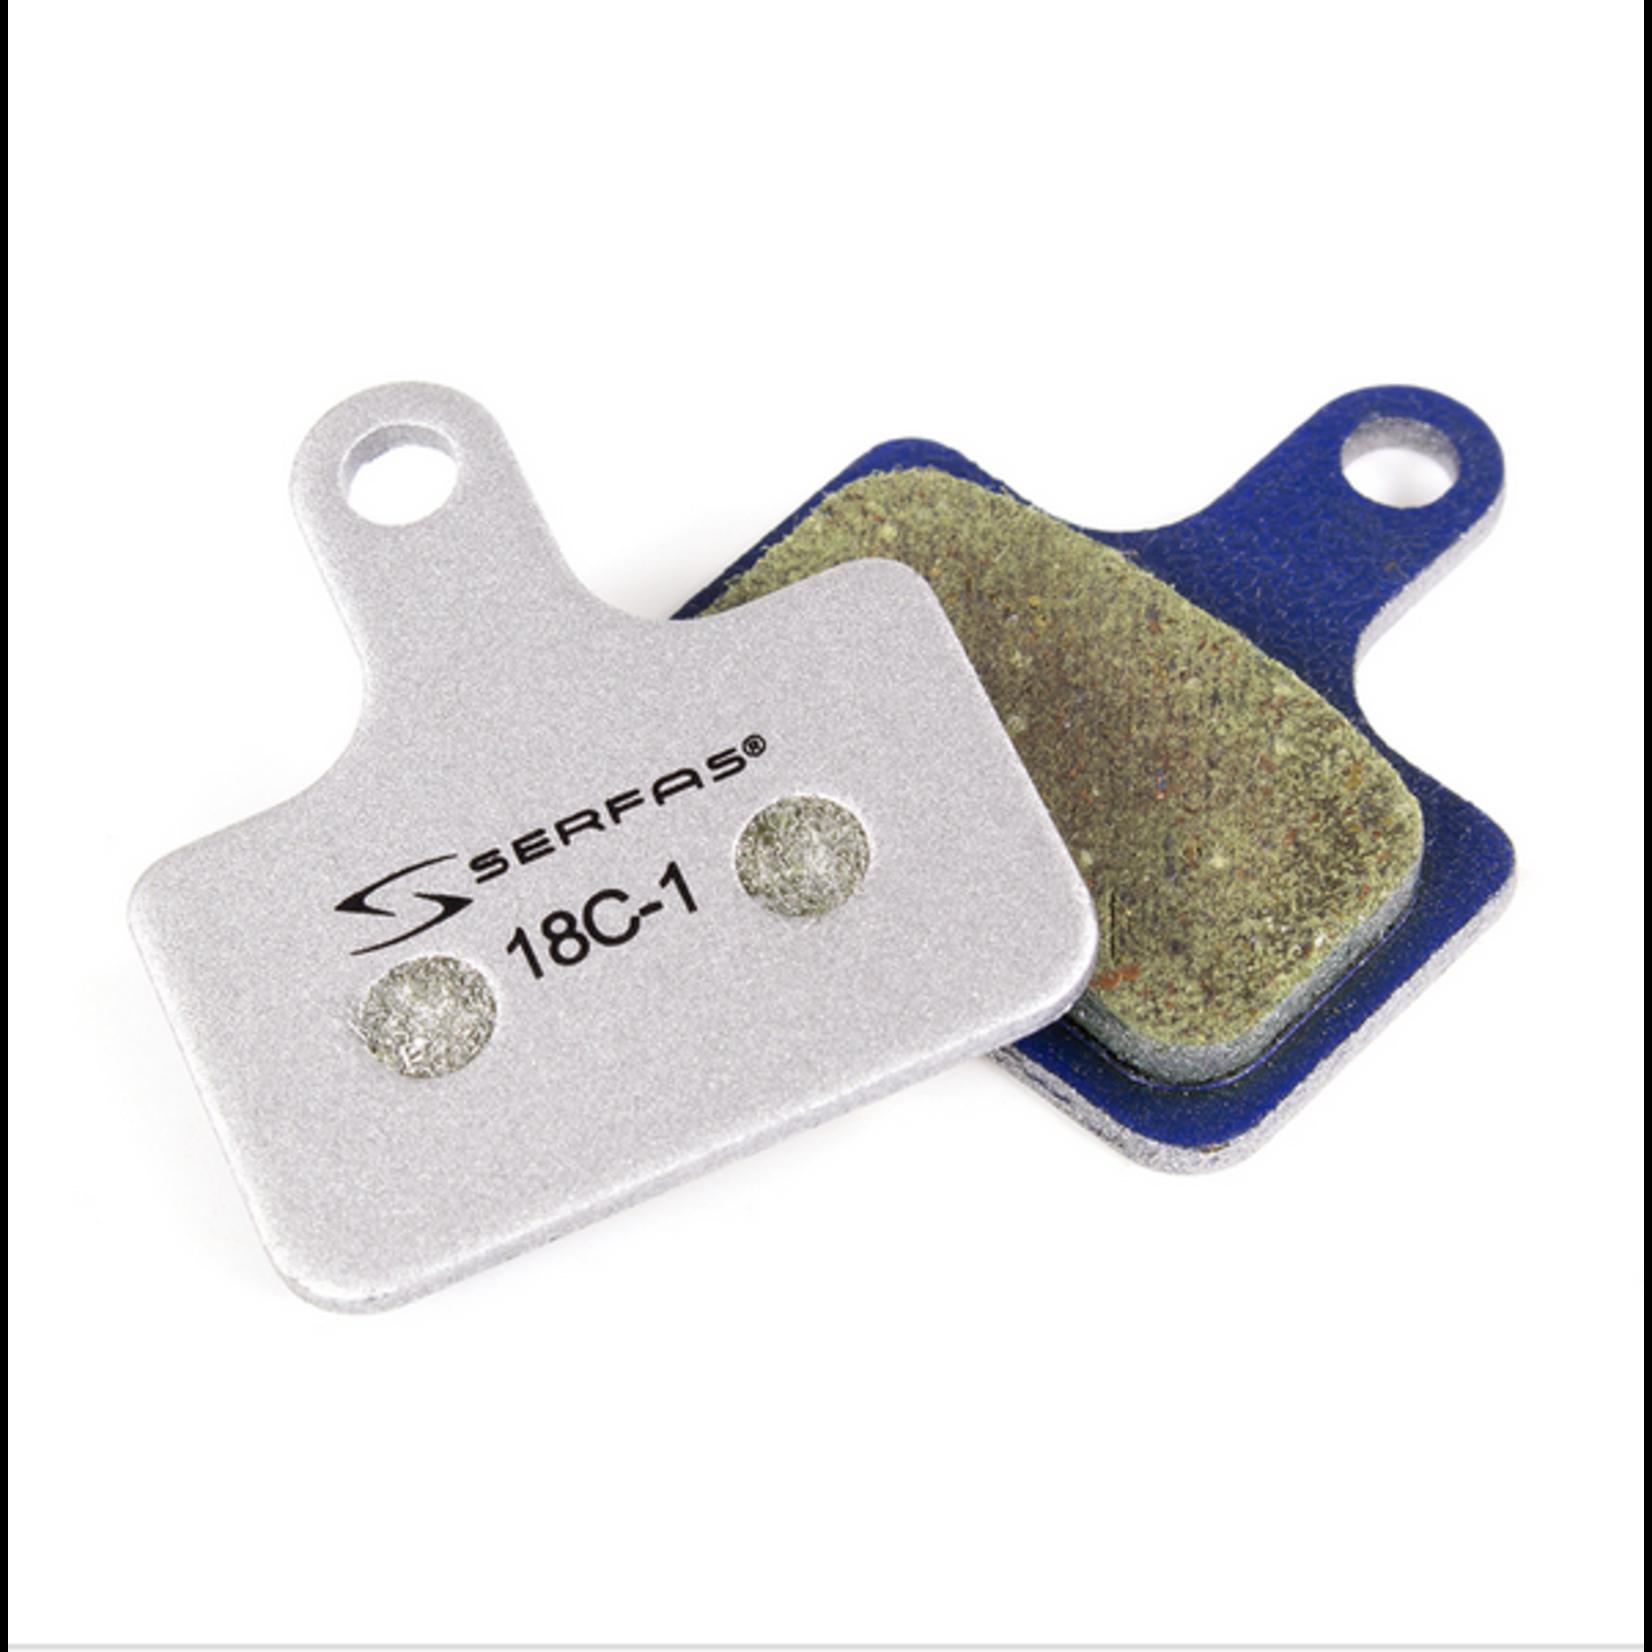 SERFAS DBPS7 Shimano® Ultegra BR-RS805/505 SERFAS